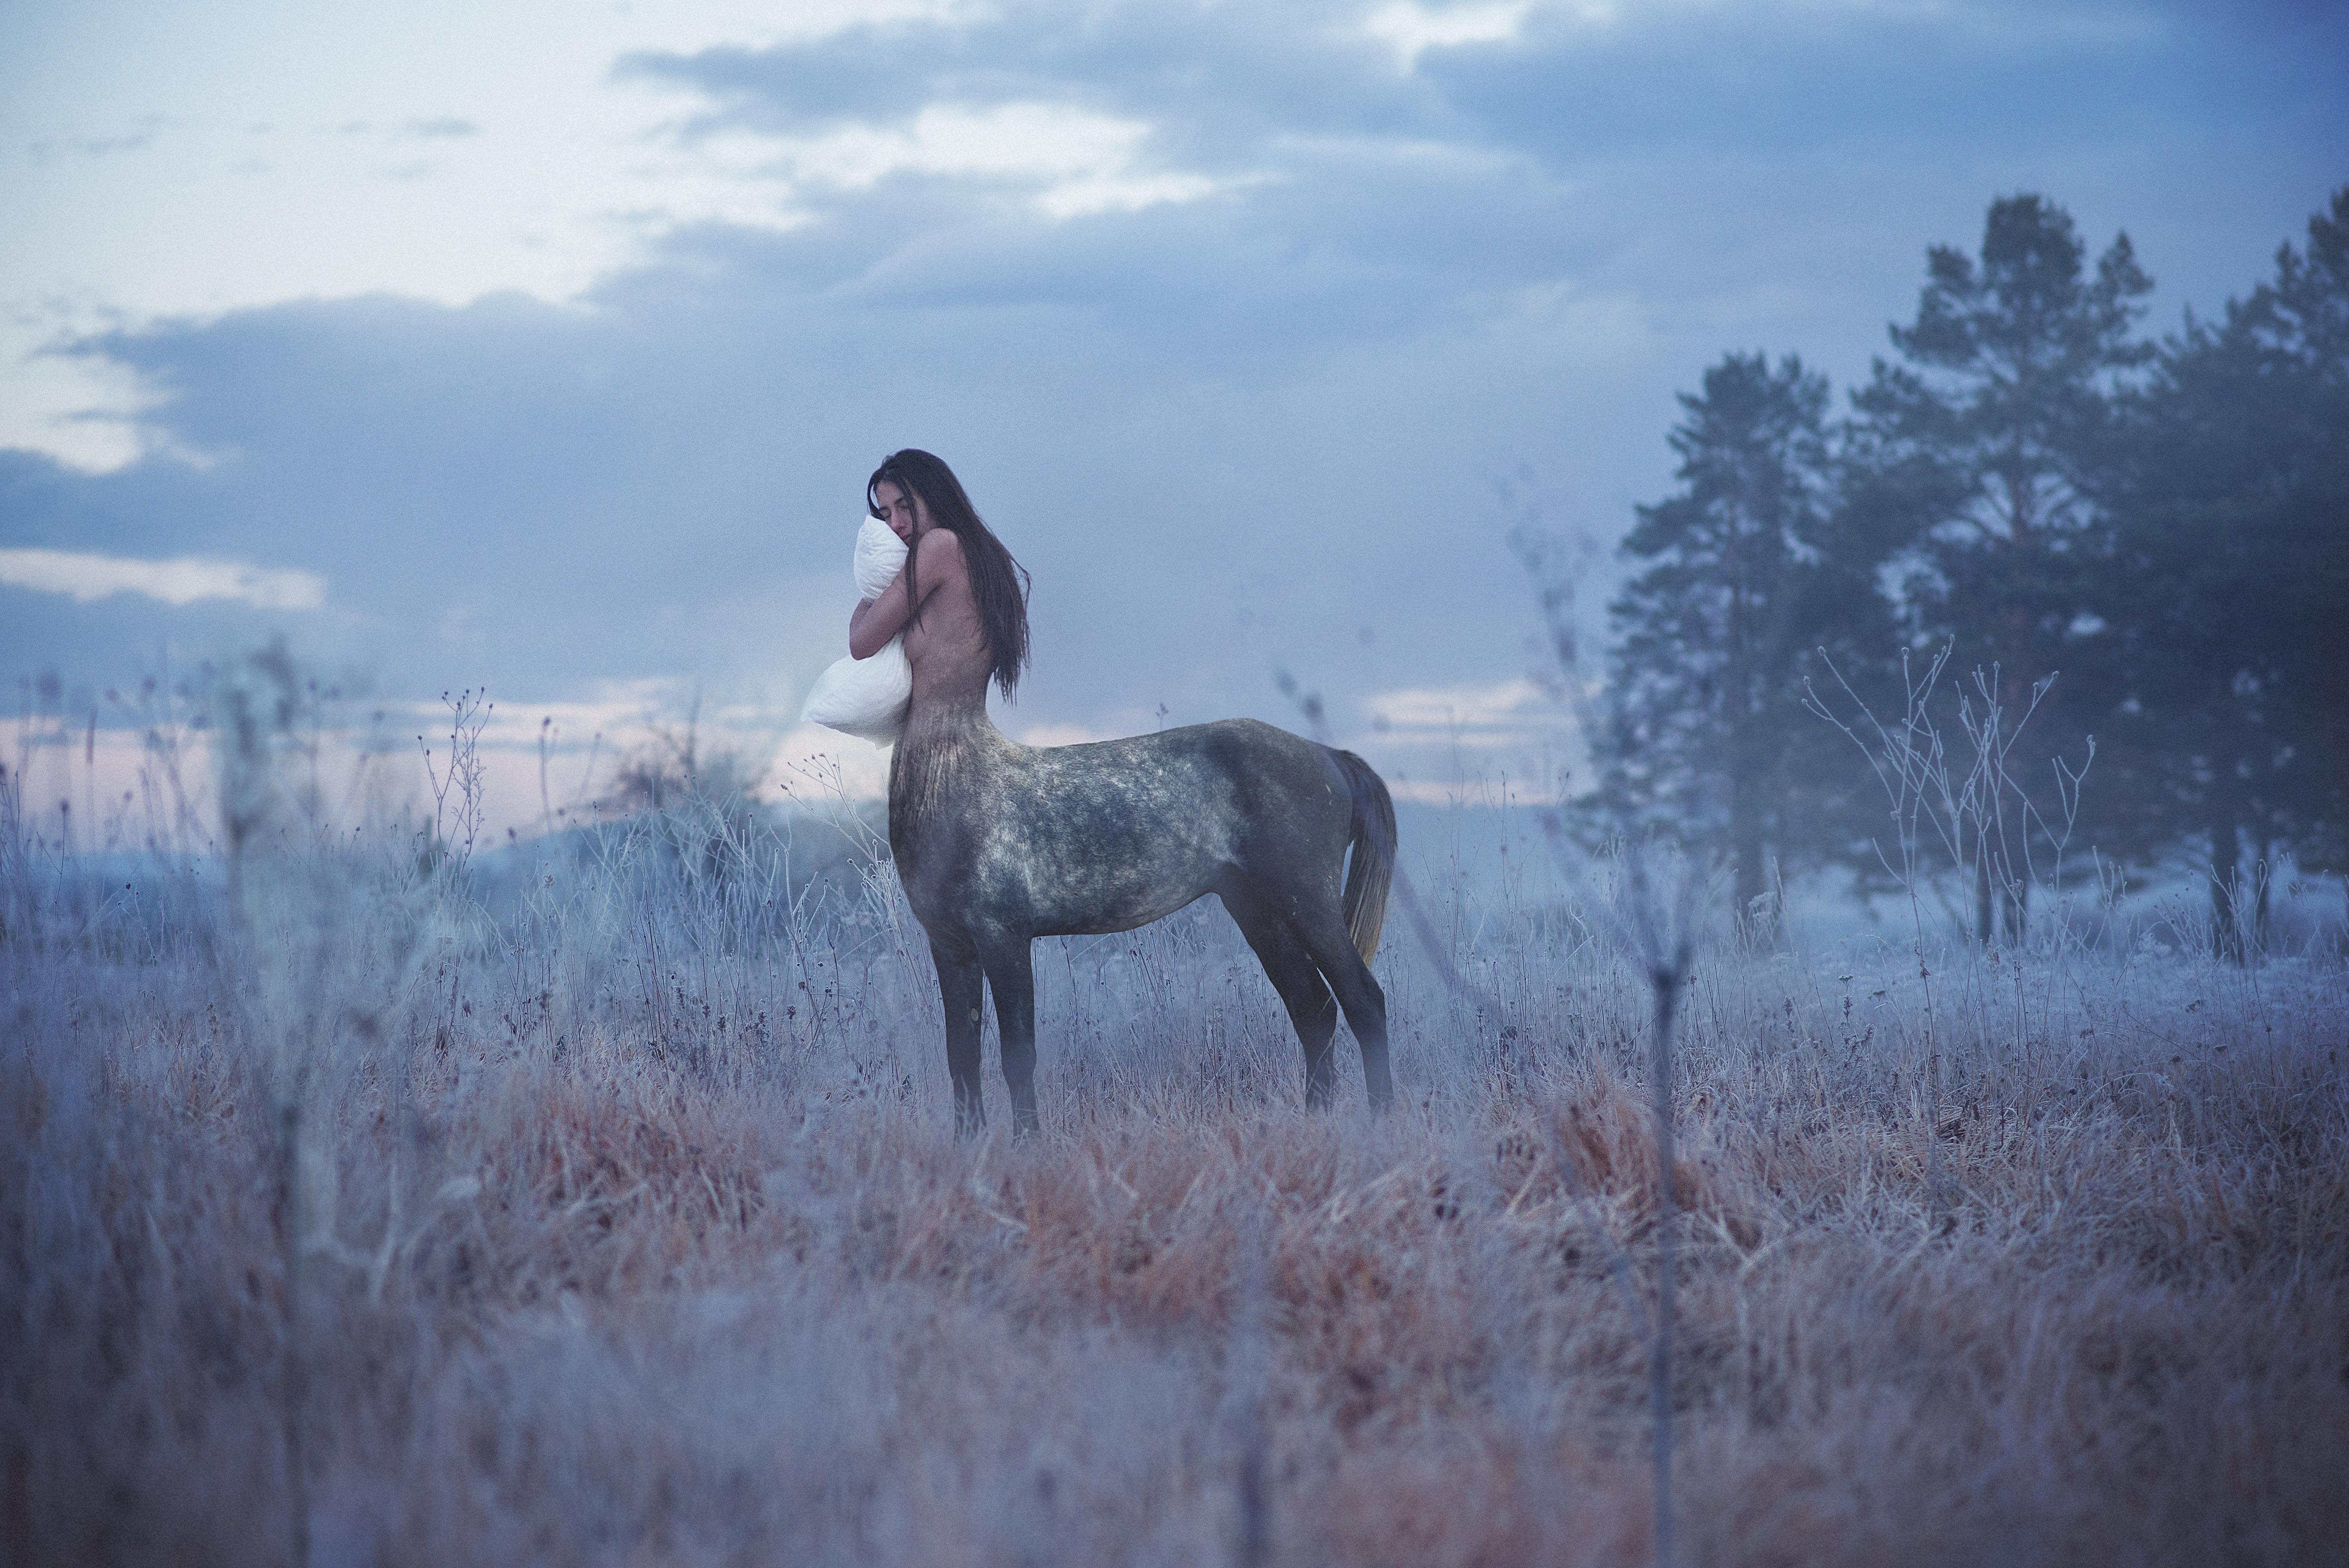 Centaurs - Unique Creatures of Greek Mythology